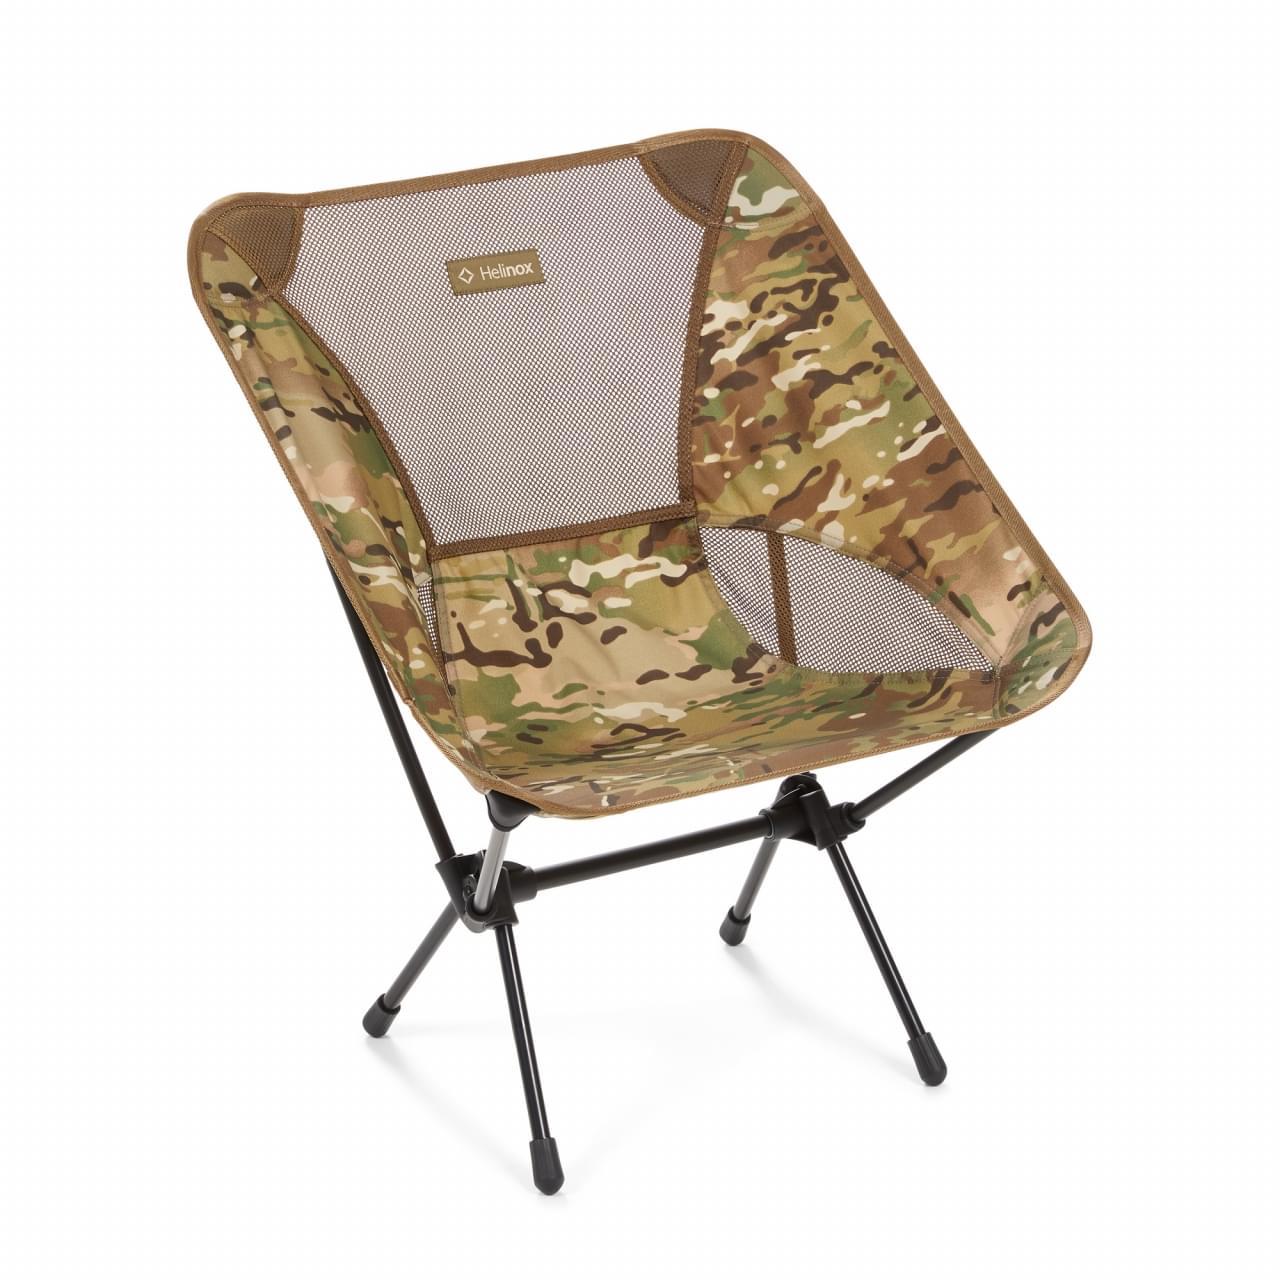 Helinox Chair One Special Lichtgewicht Stoel - Camouflage Groen